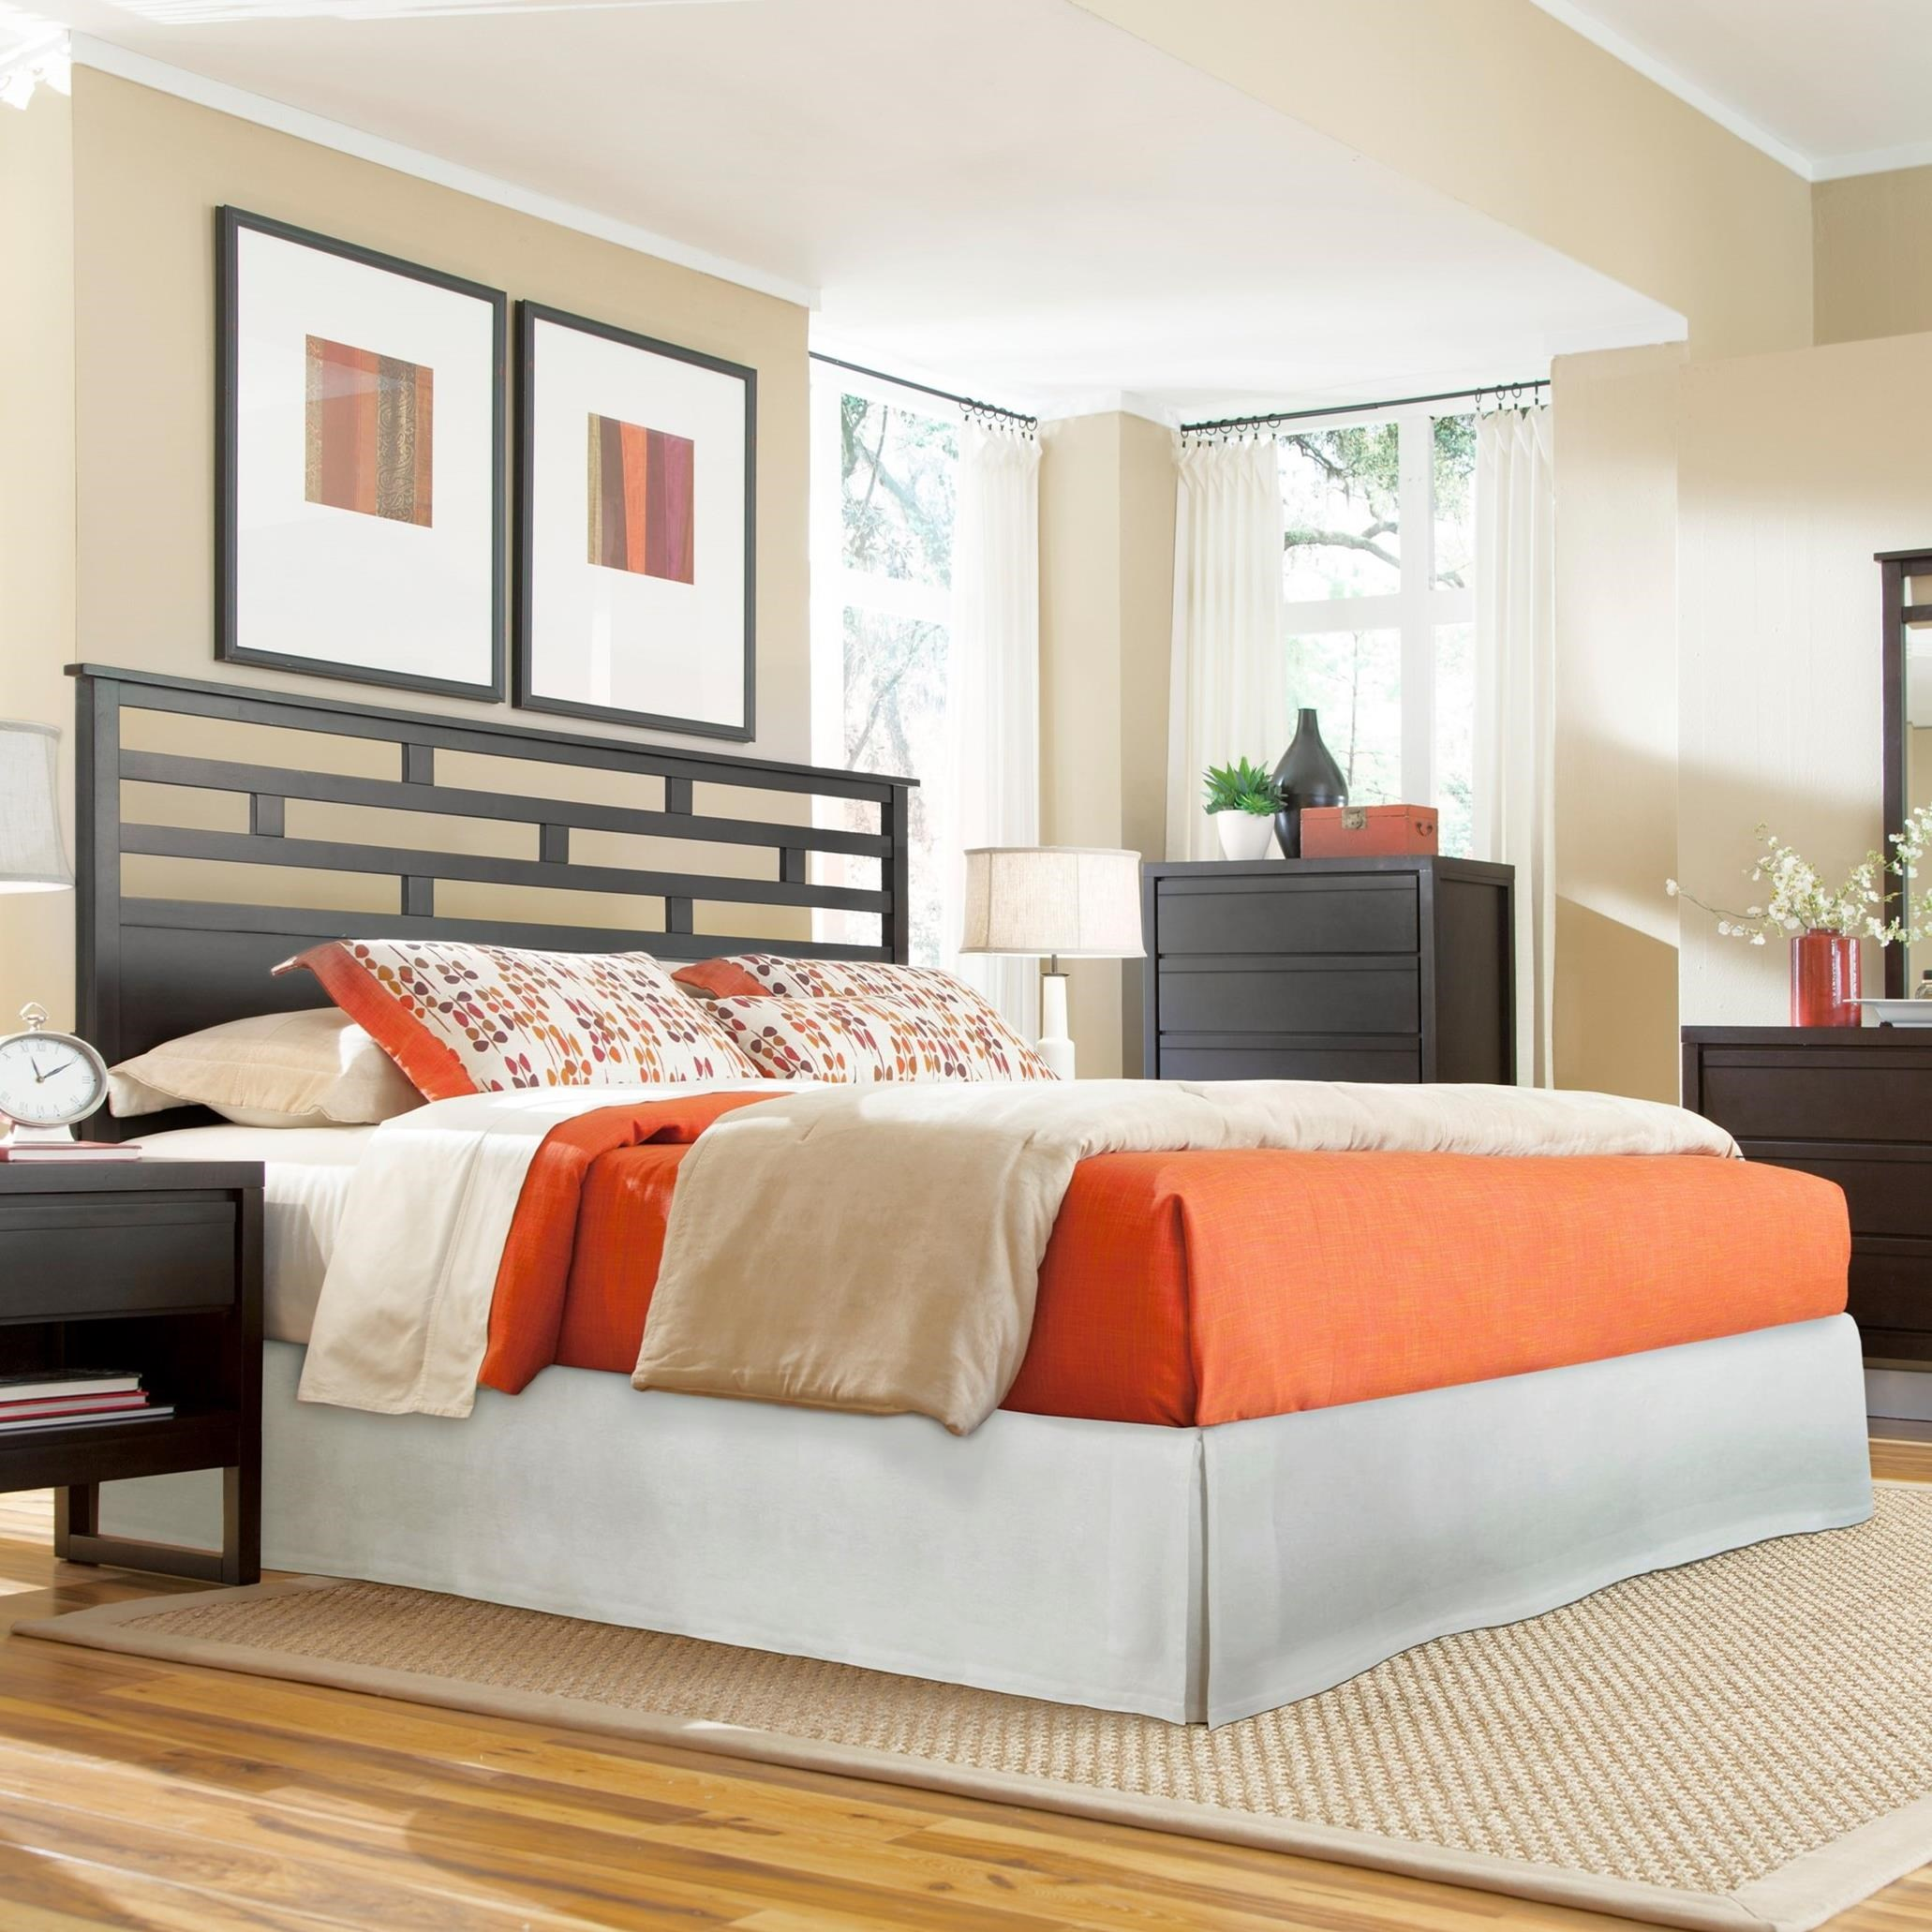 Athena King Panel Headboard by Progressive Furniture at Carolina Direct